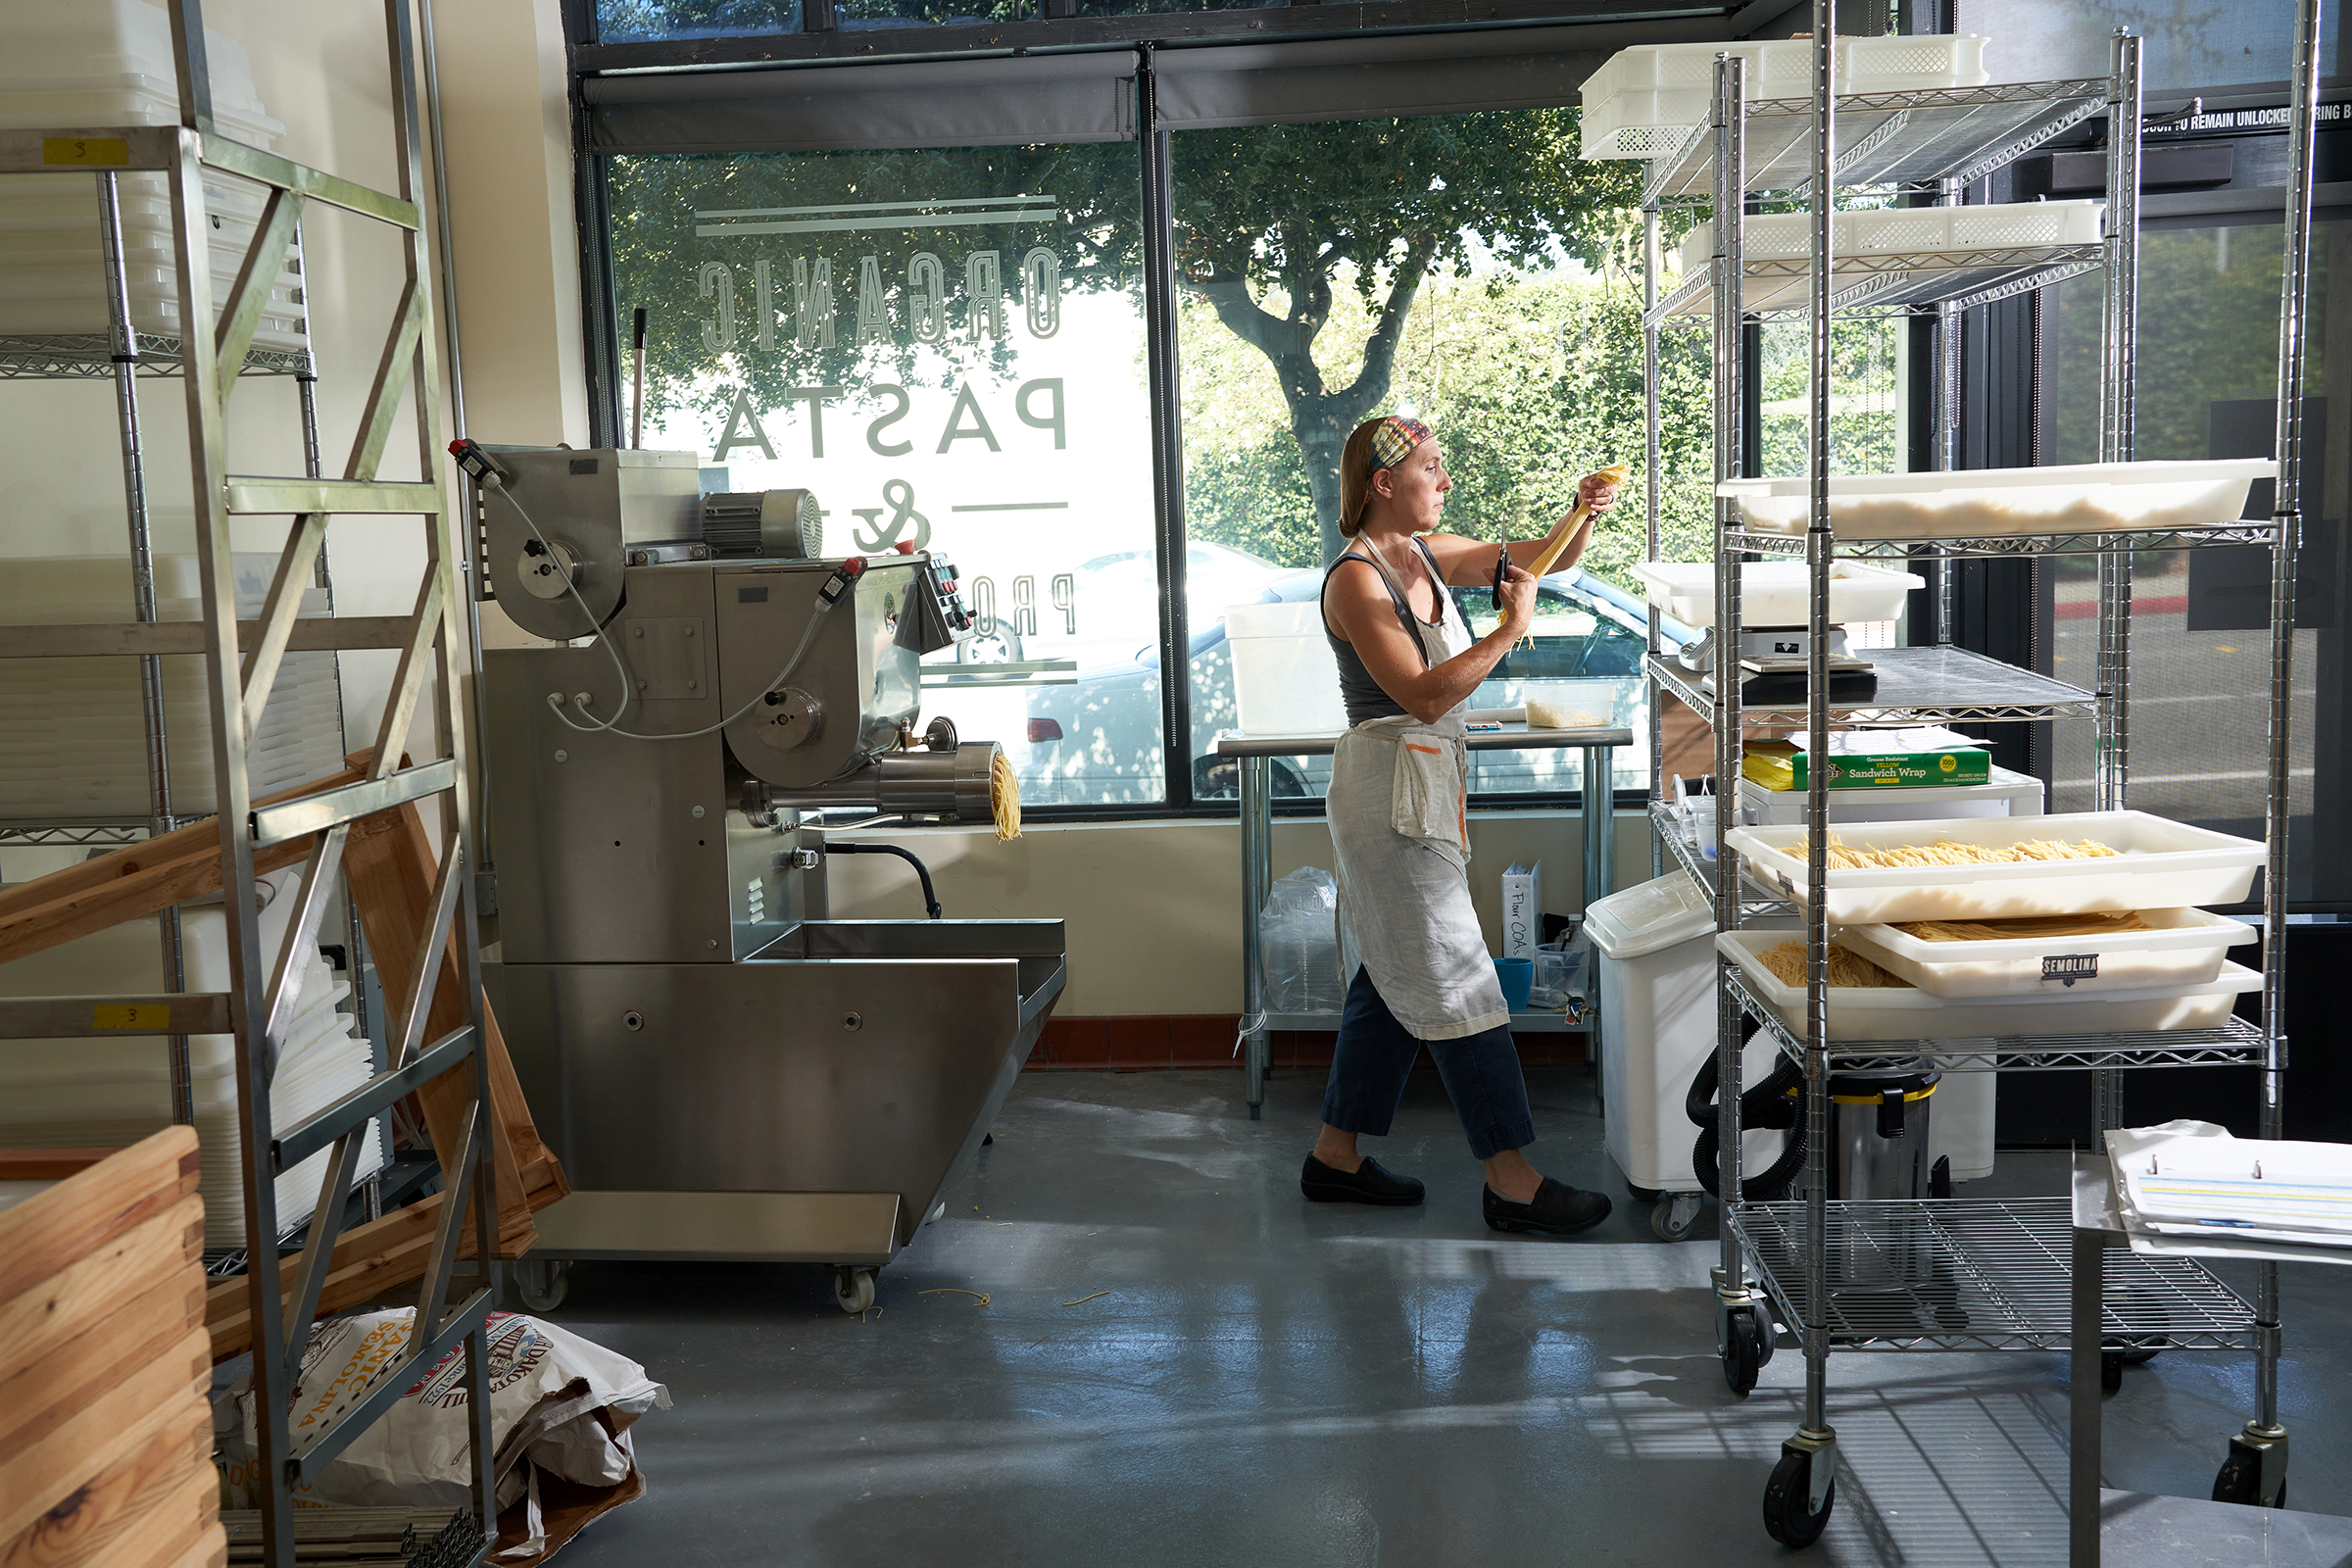 Leah Ferrazzani at Semolina Artisanal Pasta in Pasadena, Calif., on July 19, 2021.